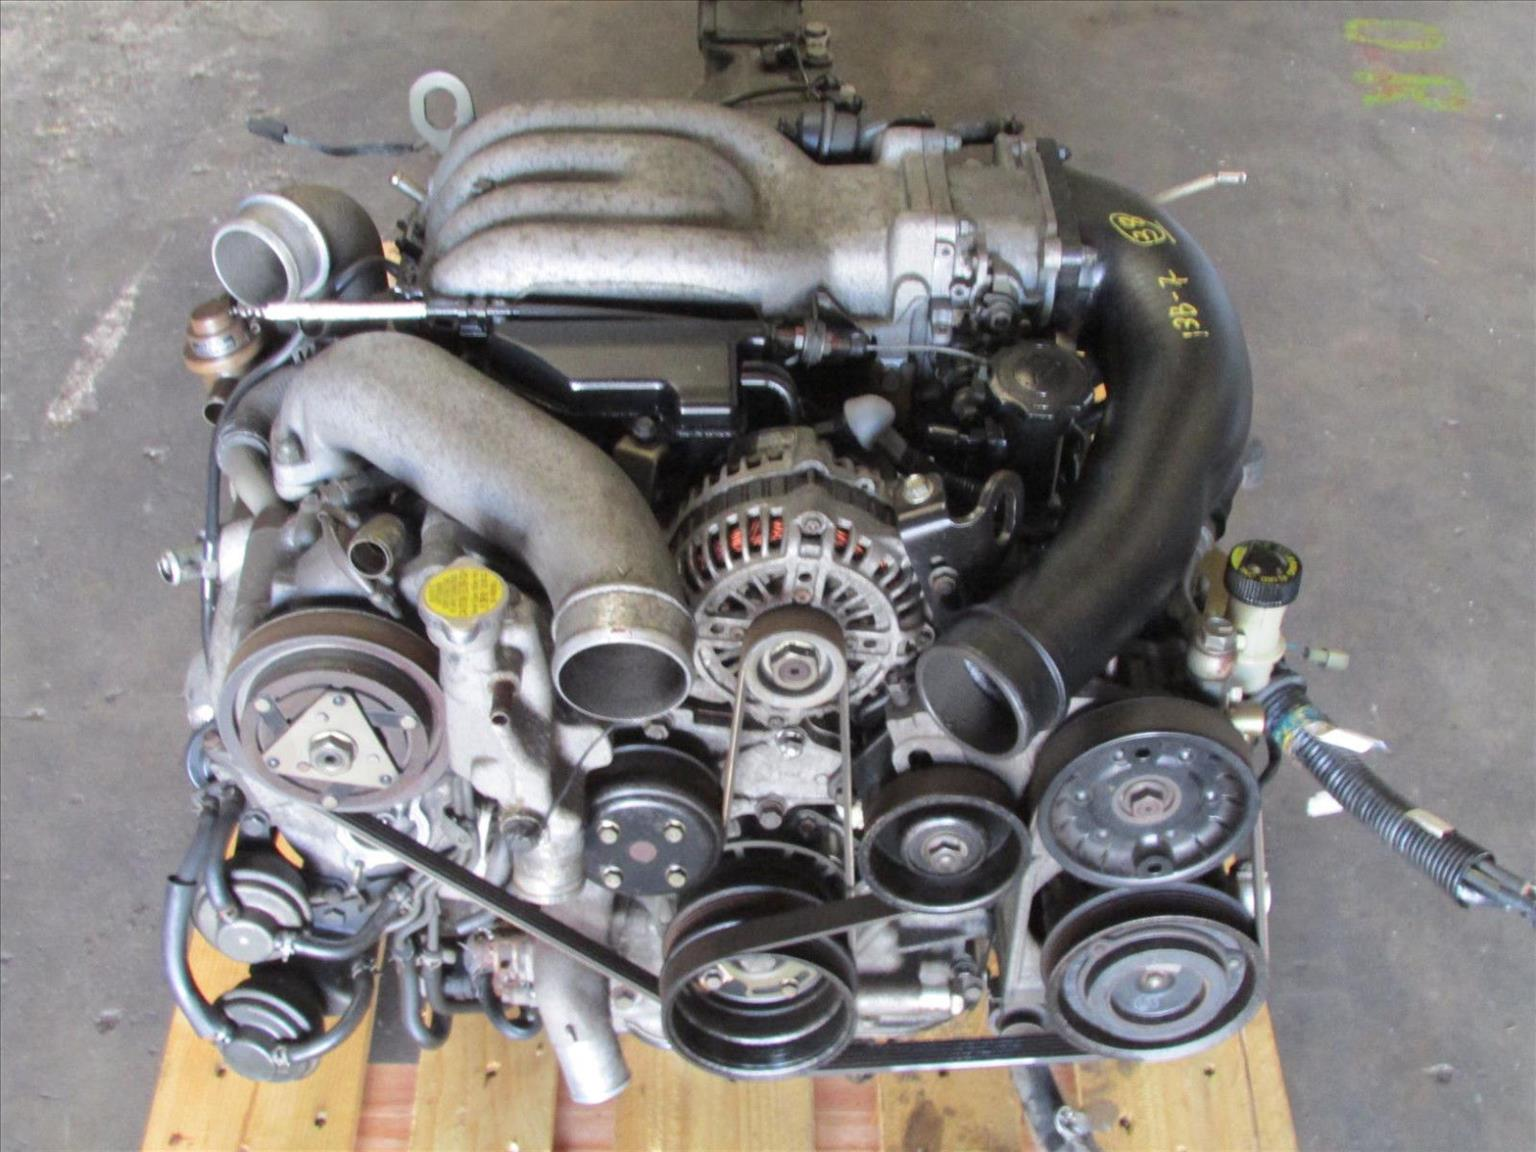 JDM Mazda RX7 FD3S Twin Turbo 13B Rotary Engine 5 Speed Manual Trans